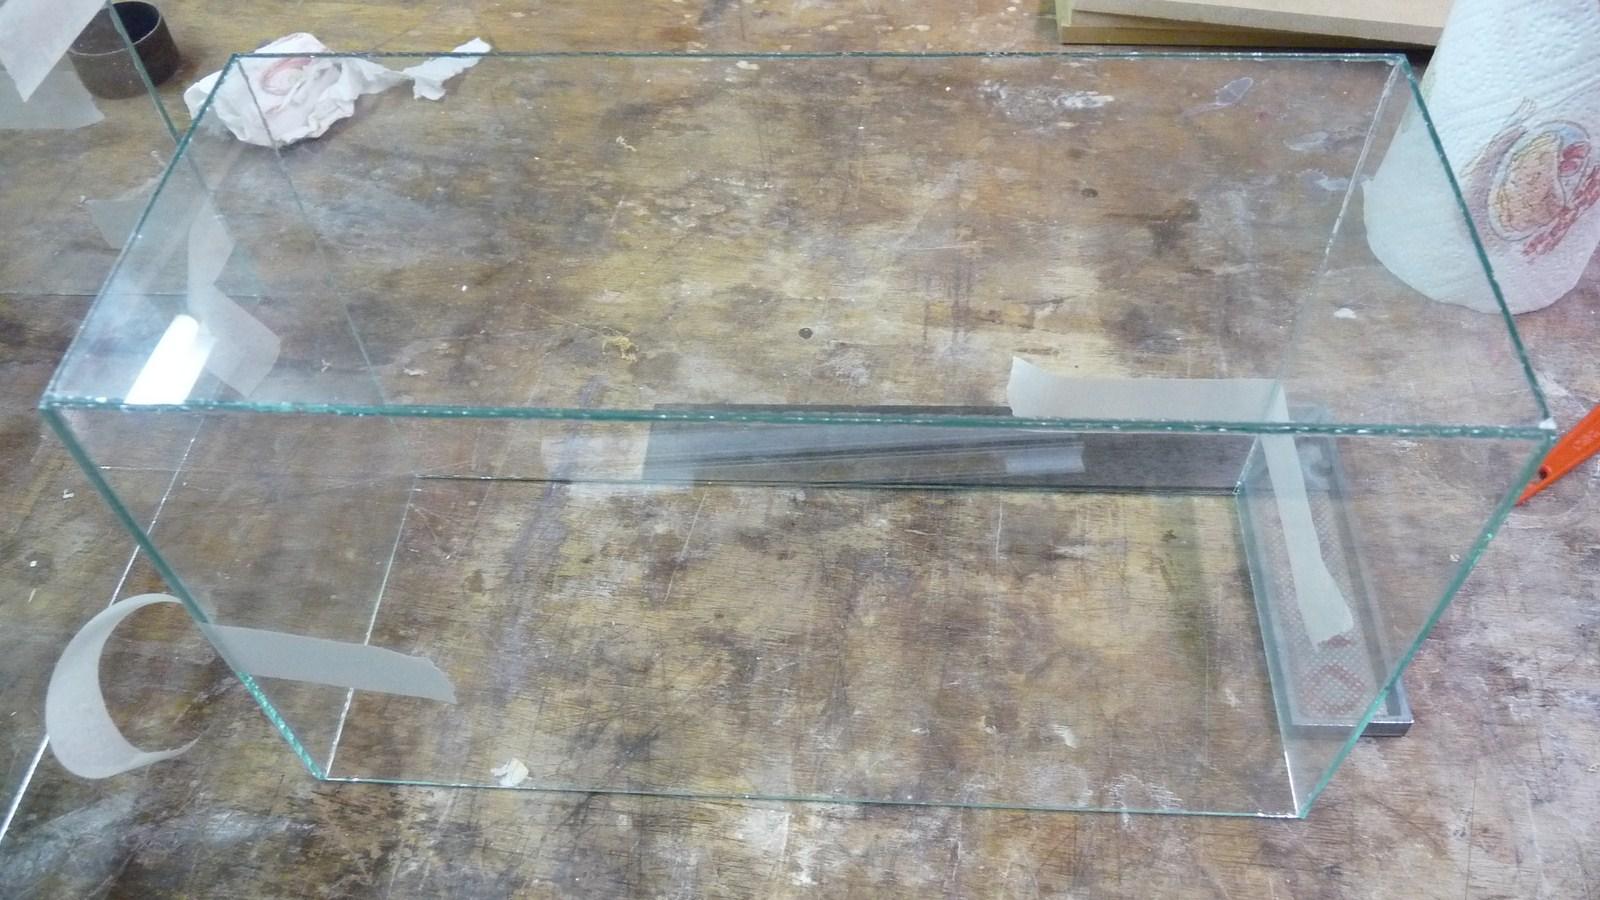 Fabriquer ses propres vitrines en verre 17071907264223134915156548